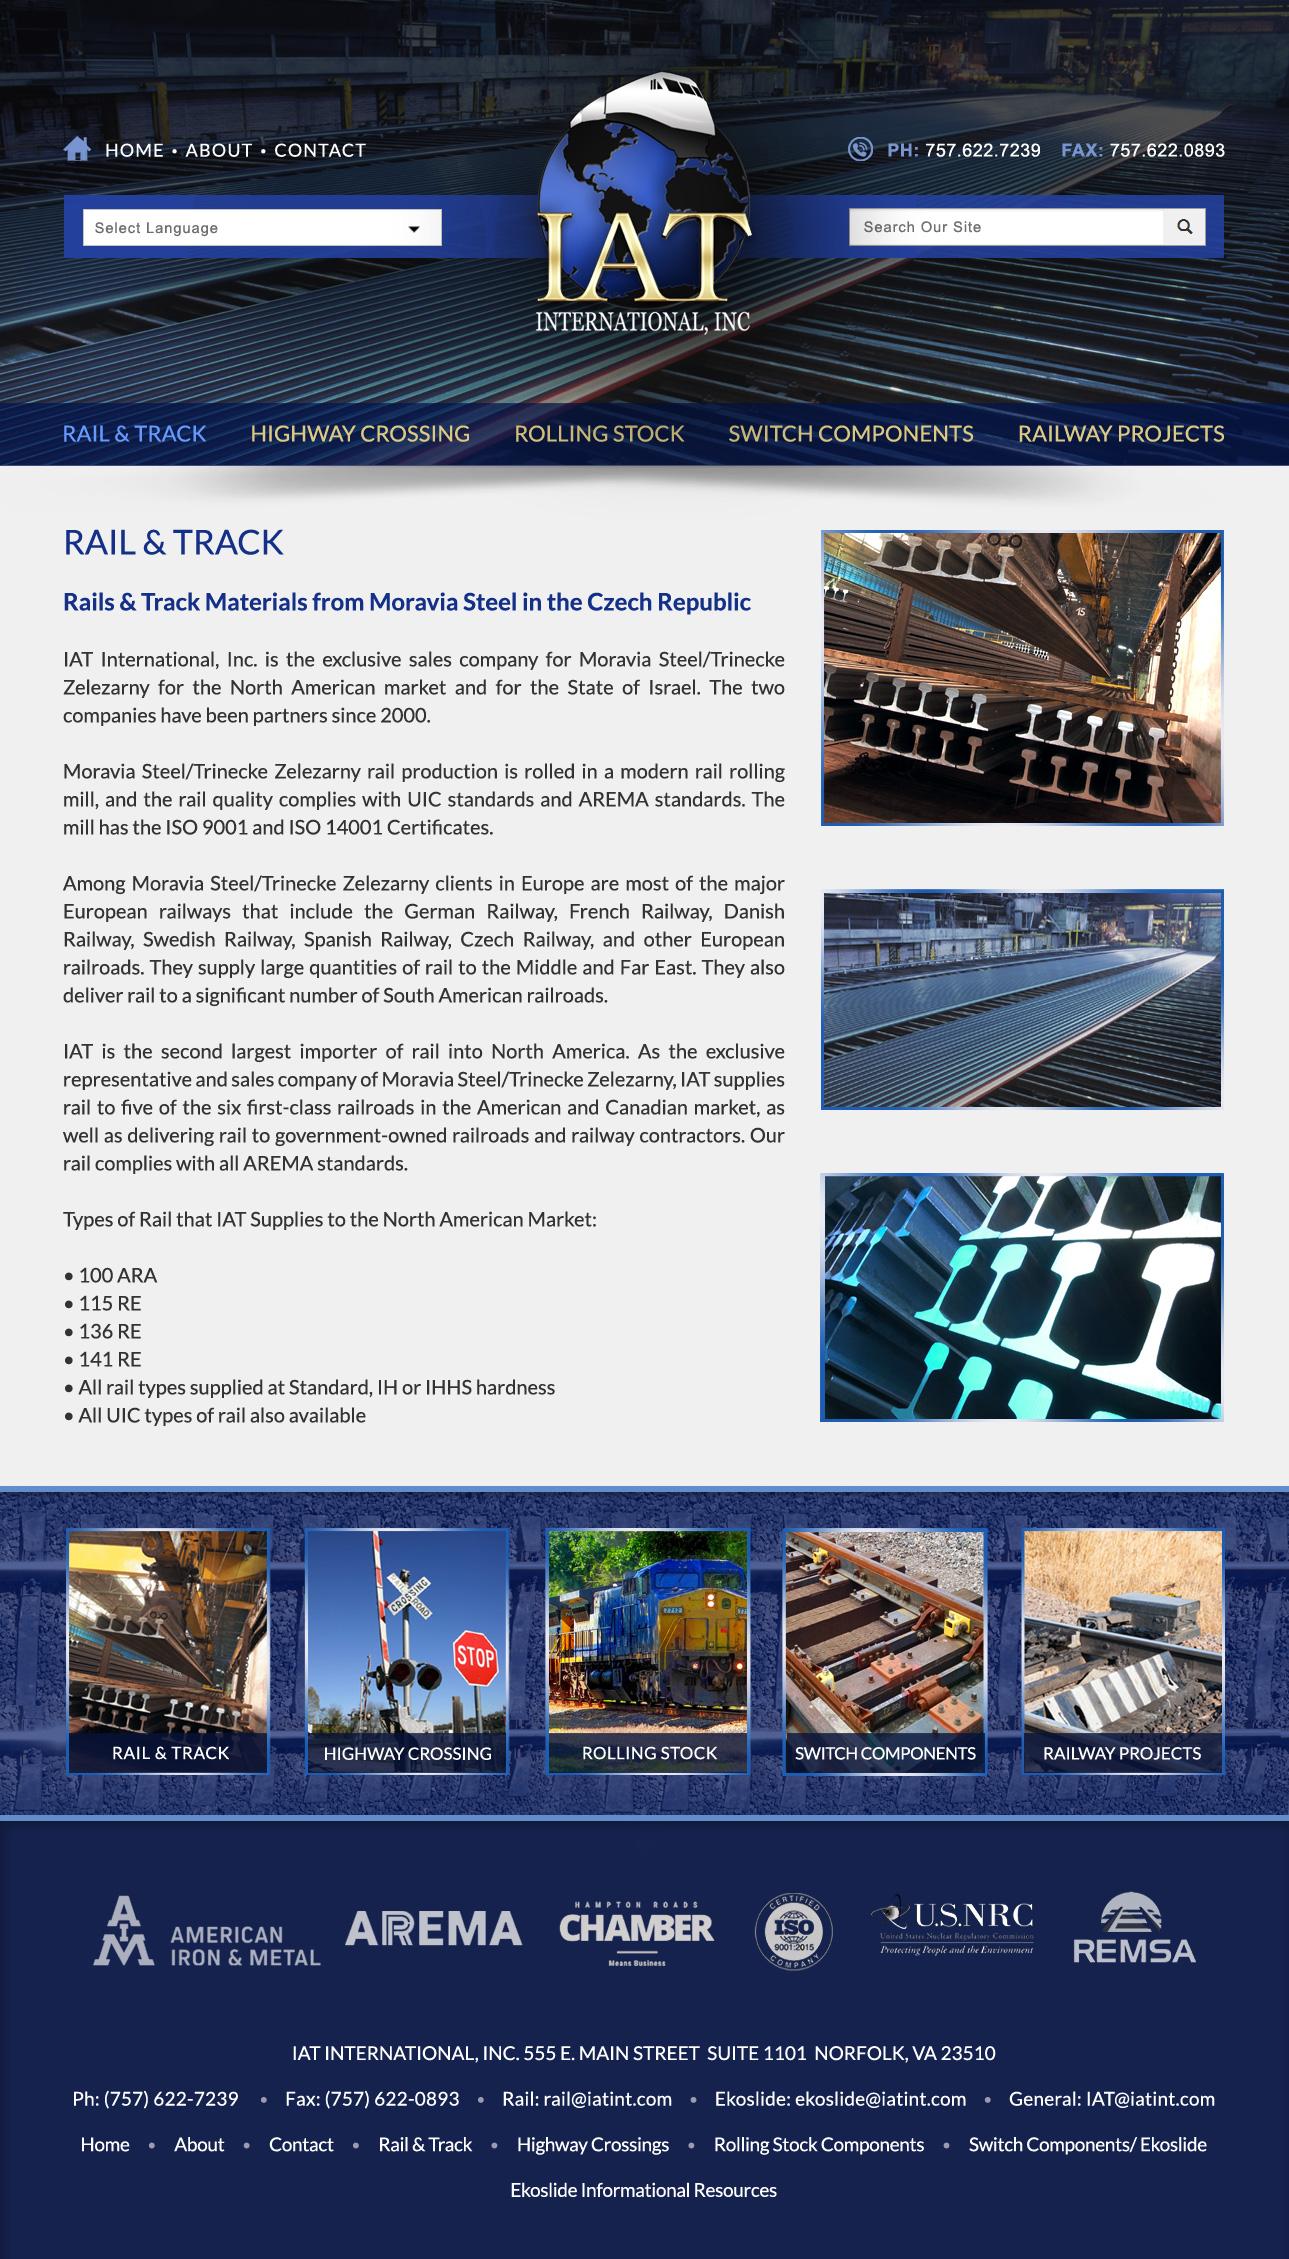 Railway, Railroad Product Company Website Design   VISIONEFX WEB DESIGN